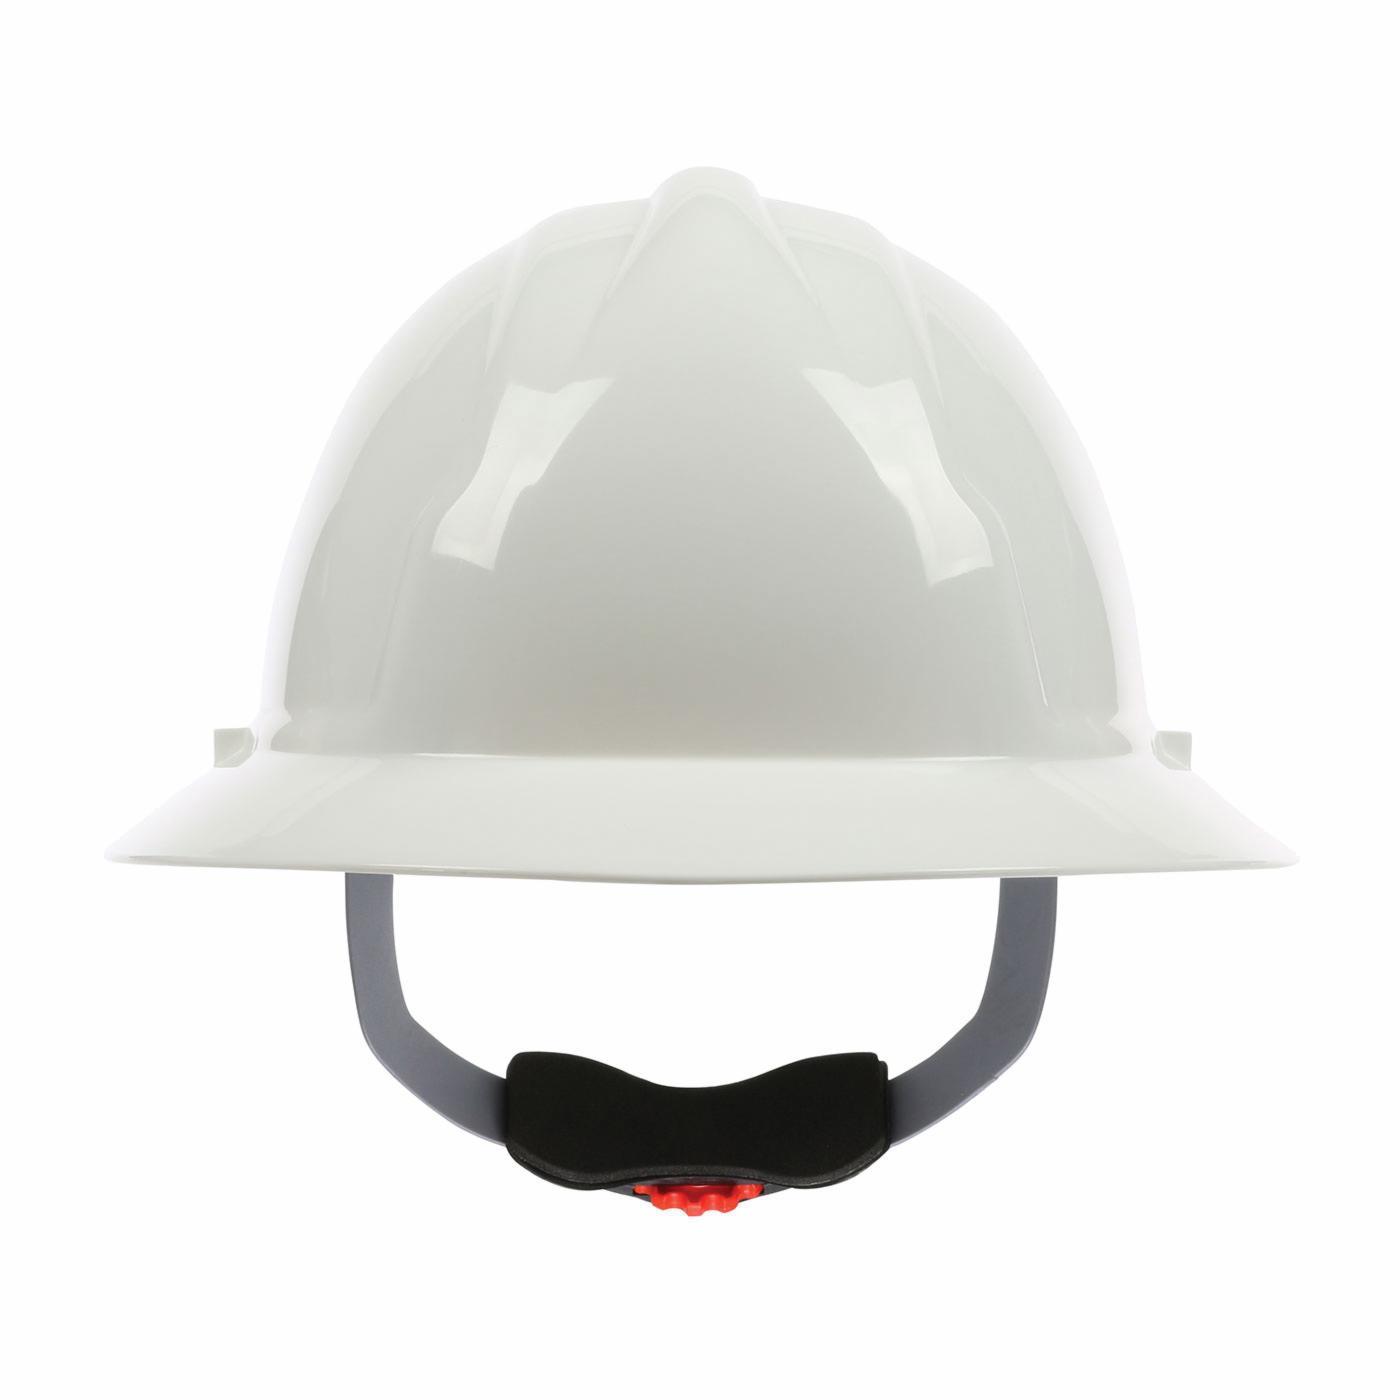 PIP®280-FBW4200-10